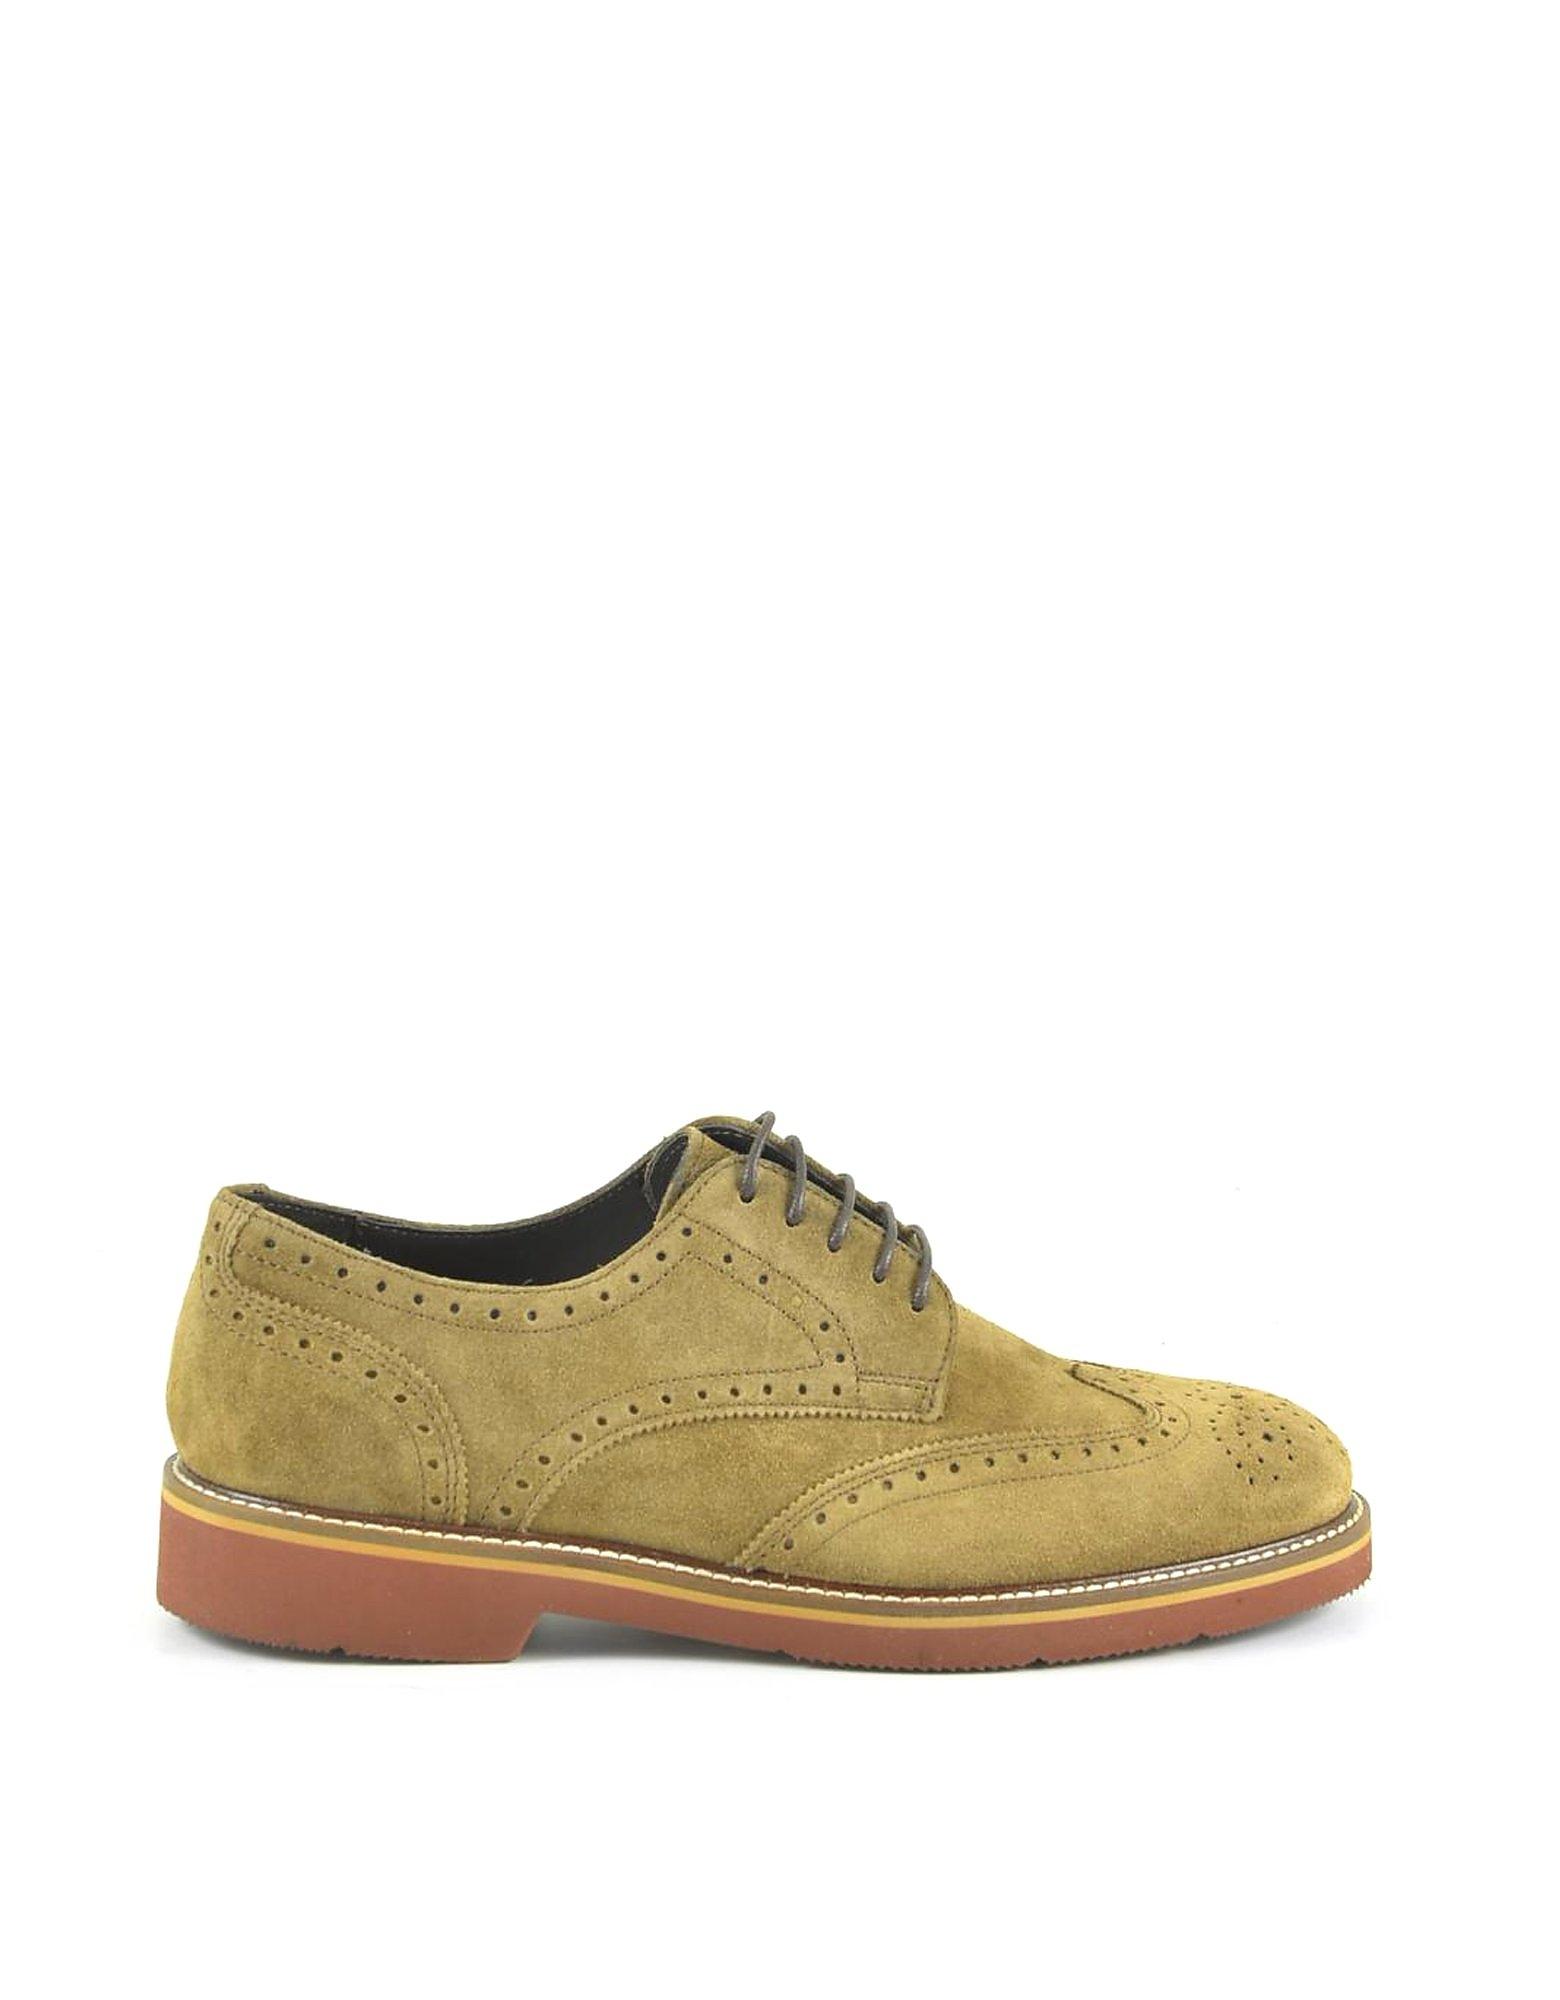 A.Testoni Designer Shoes, Men's Brown Suede Derby Shoes